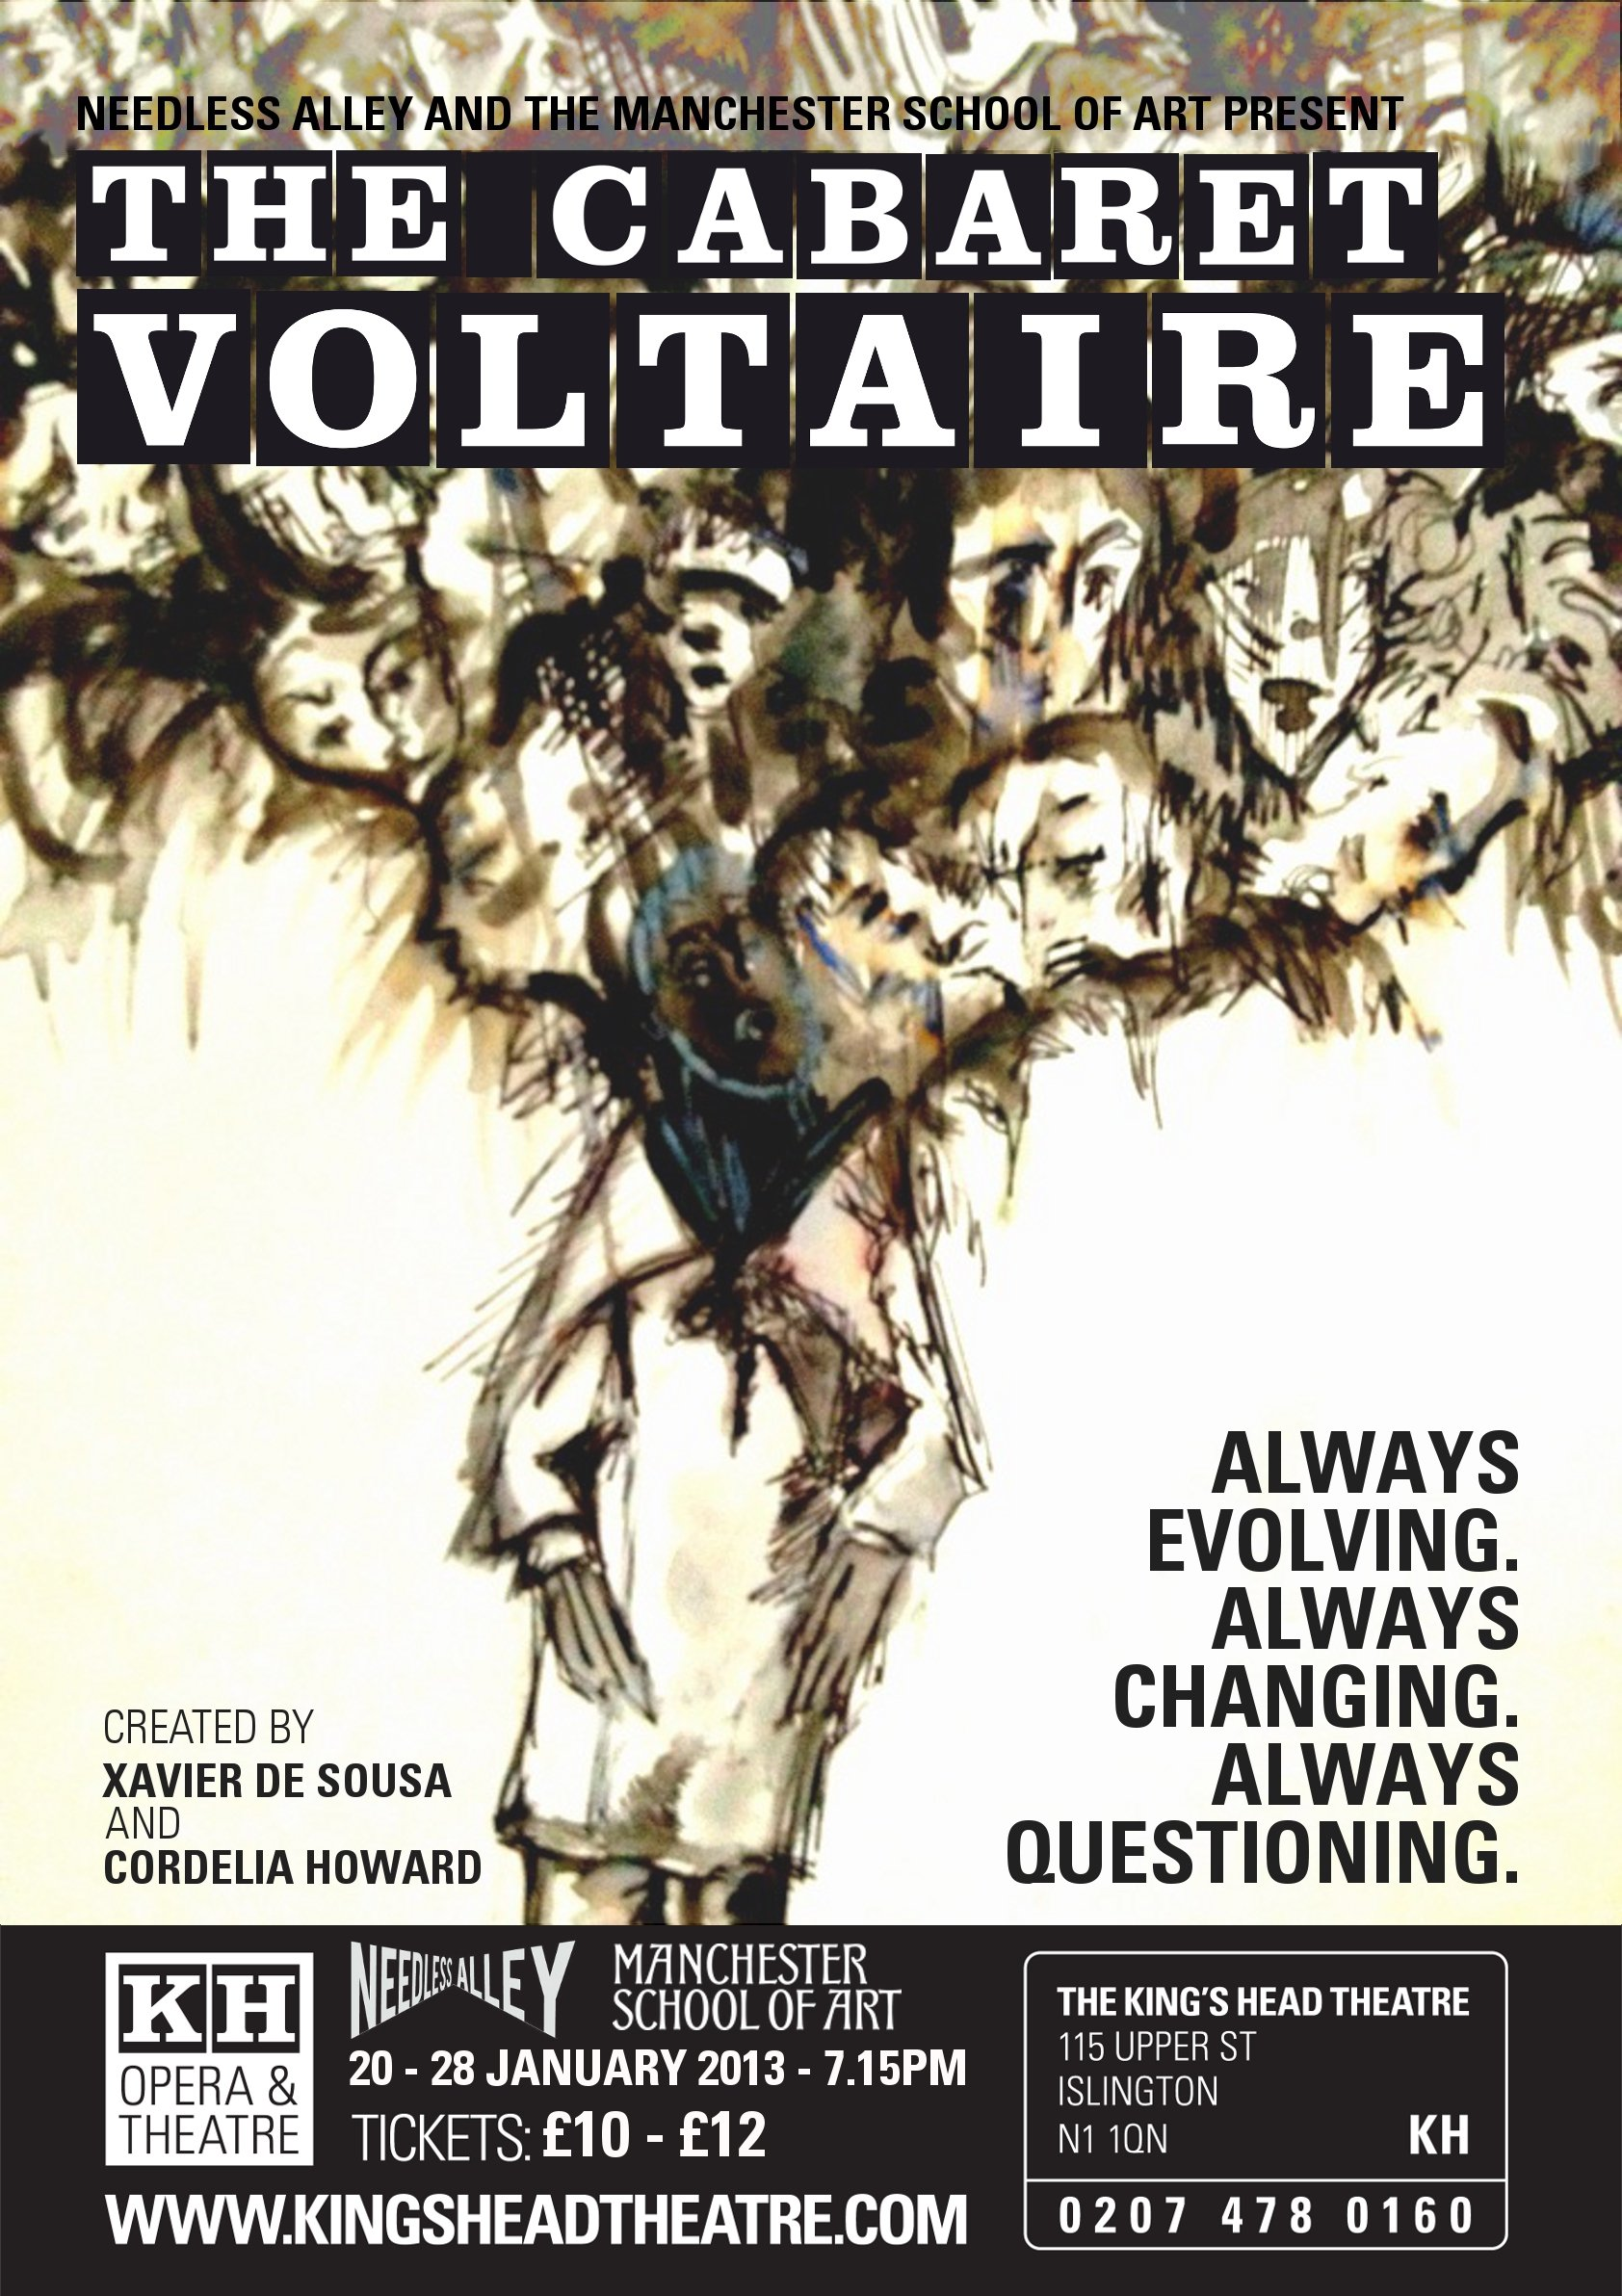 CABARET VOLTAIRE POSTER (1)